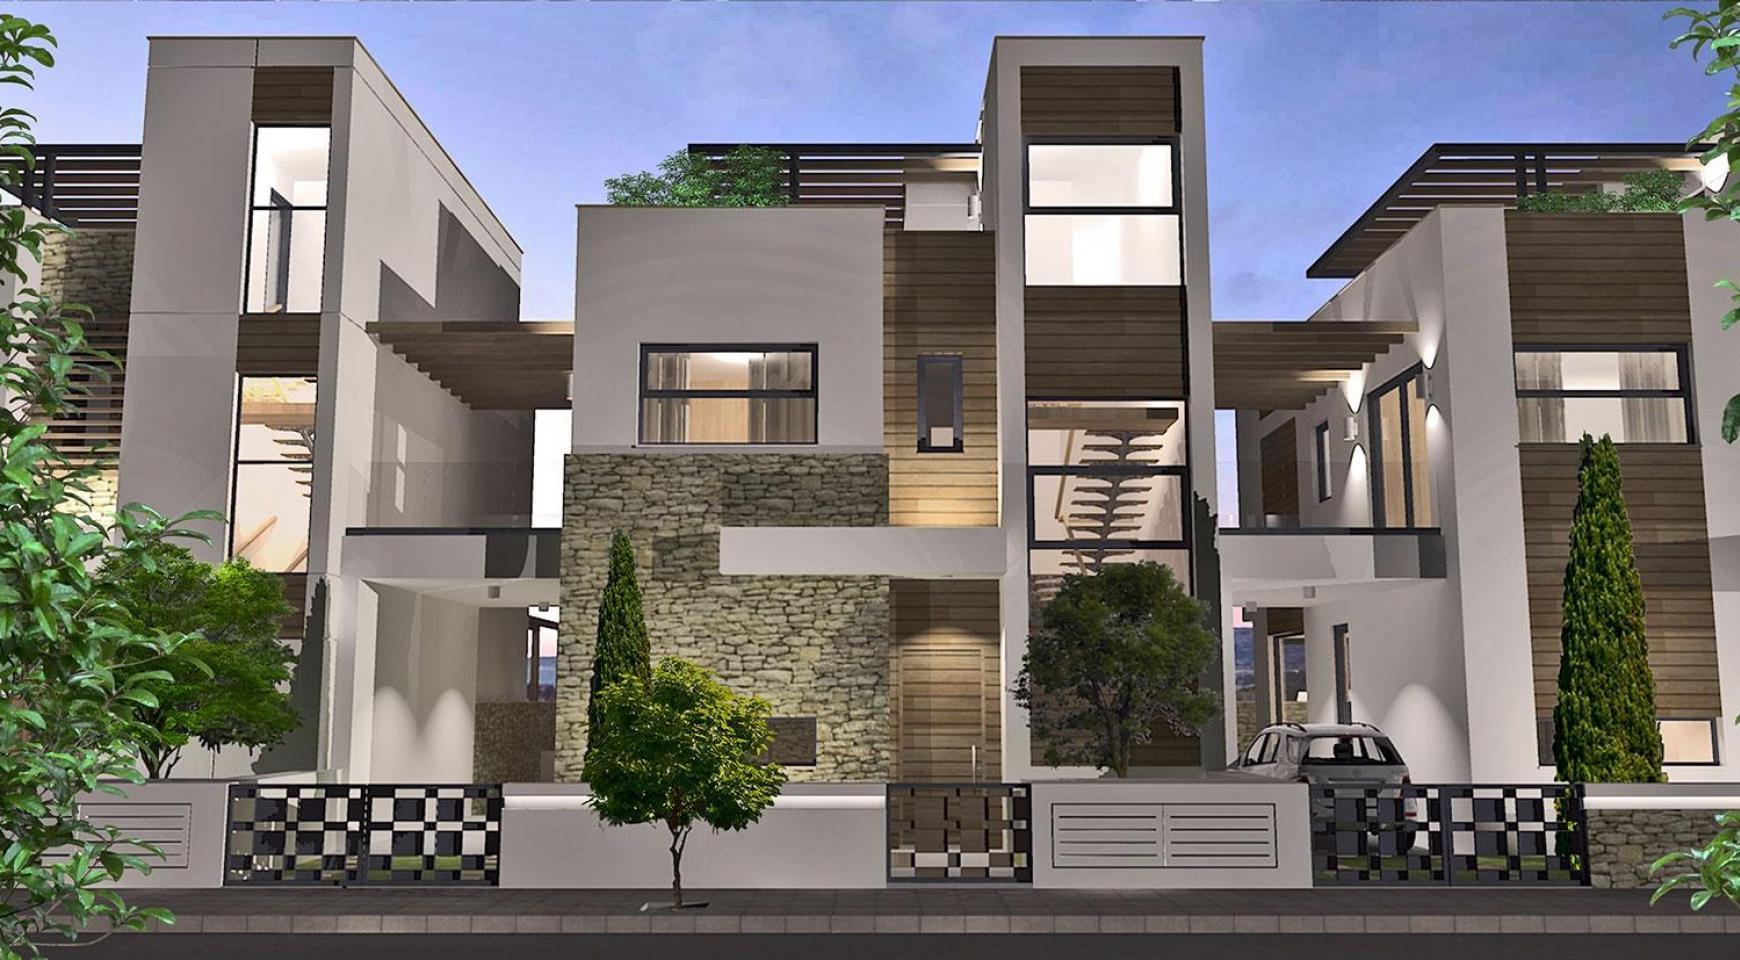 Spacious 4 Bedroom Villa in a New Complex in Agios Athanasios Area - 2